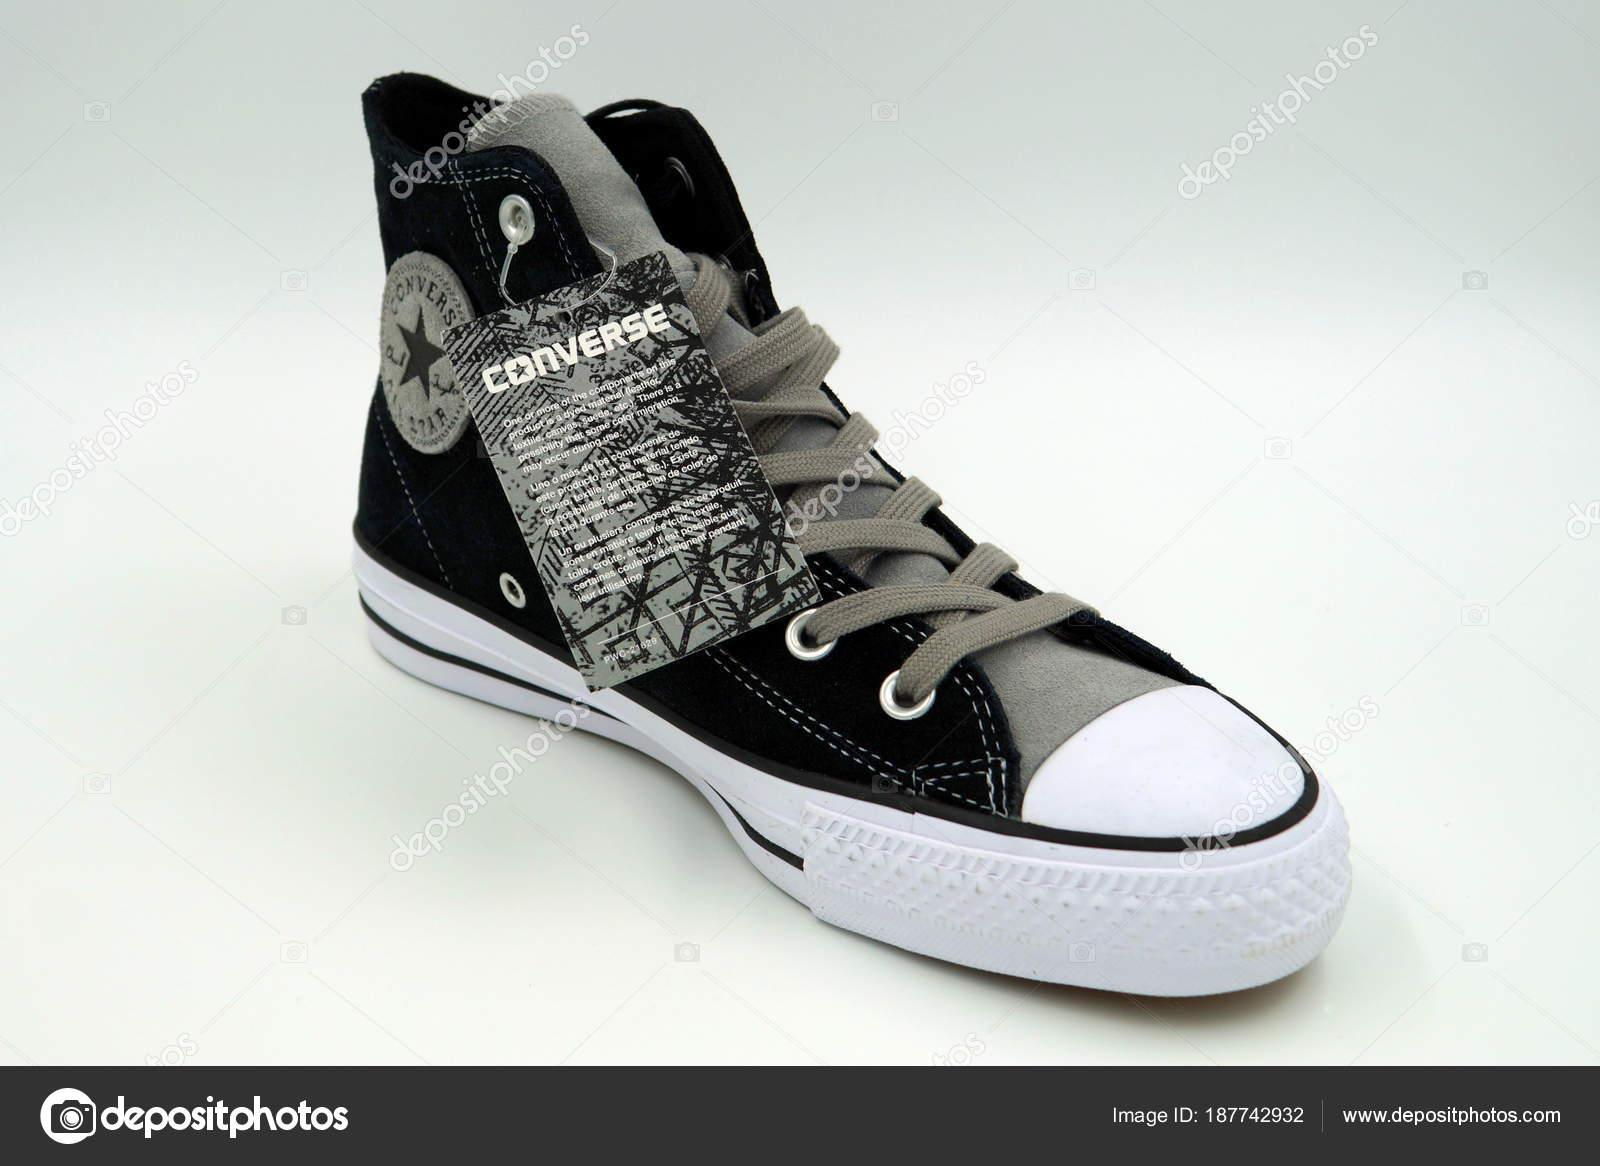 546be1e8a11 Amsterdam Netherlands December 2017 New Black Converse All Stars Sneaker —  Stock Photo